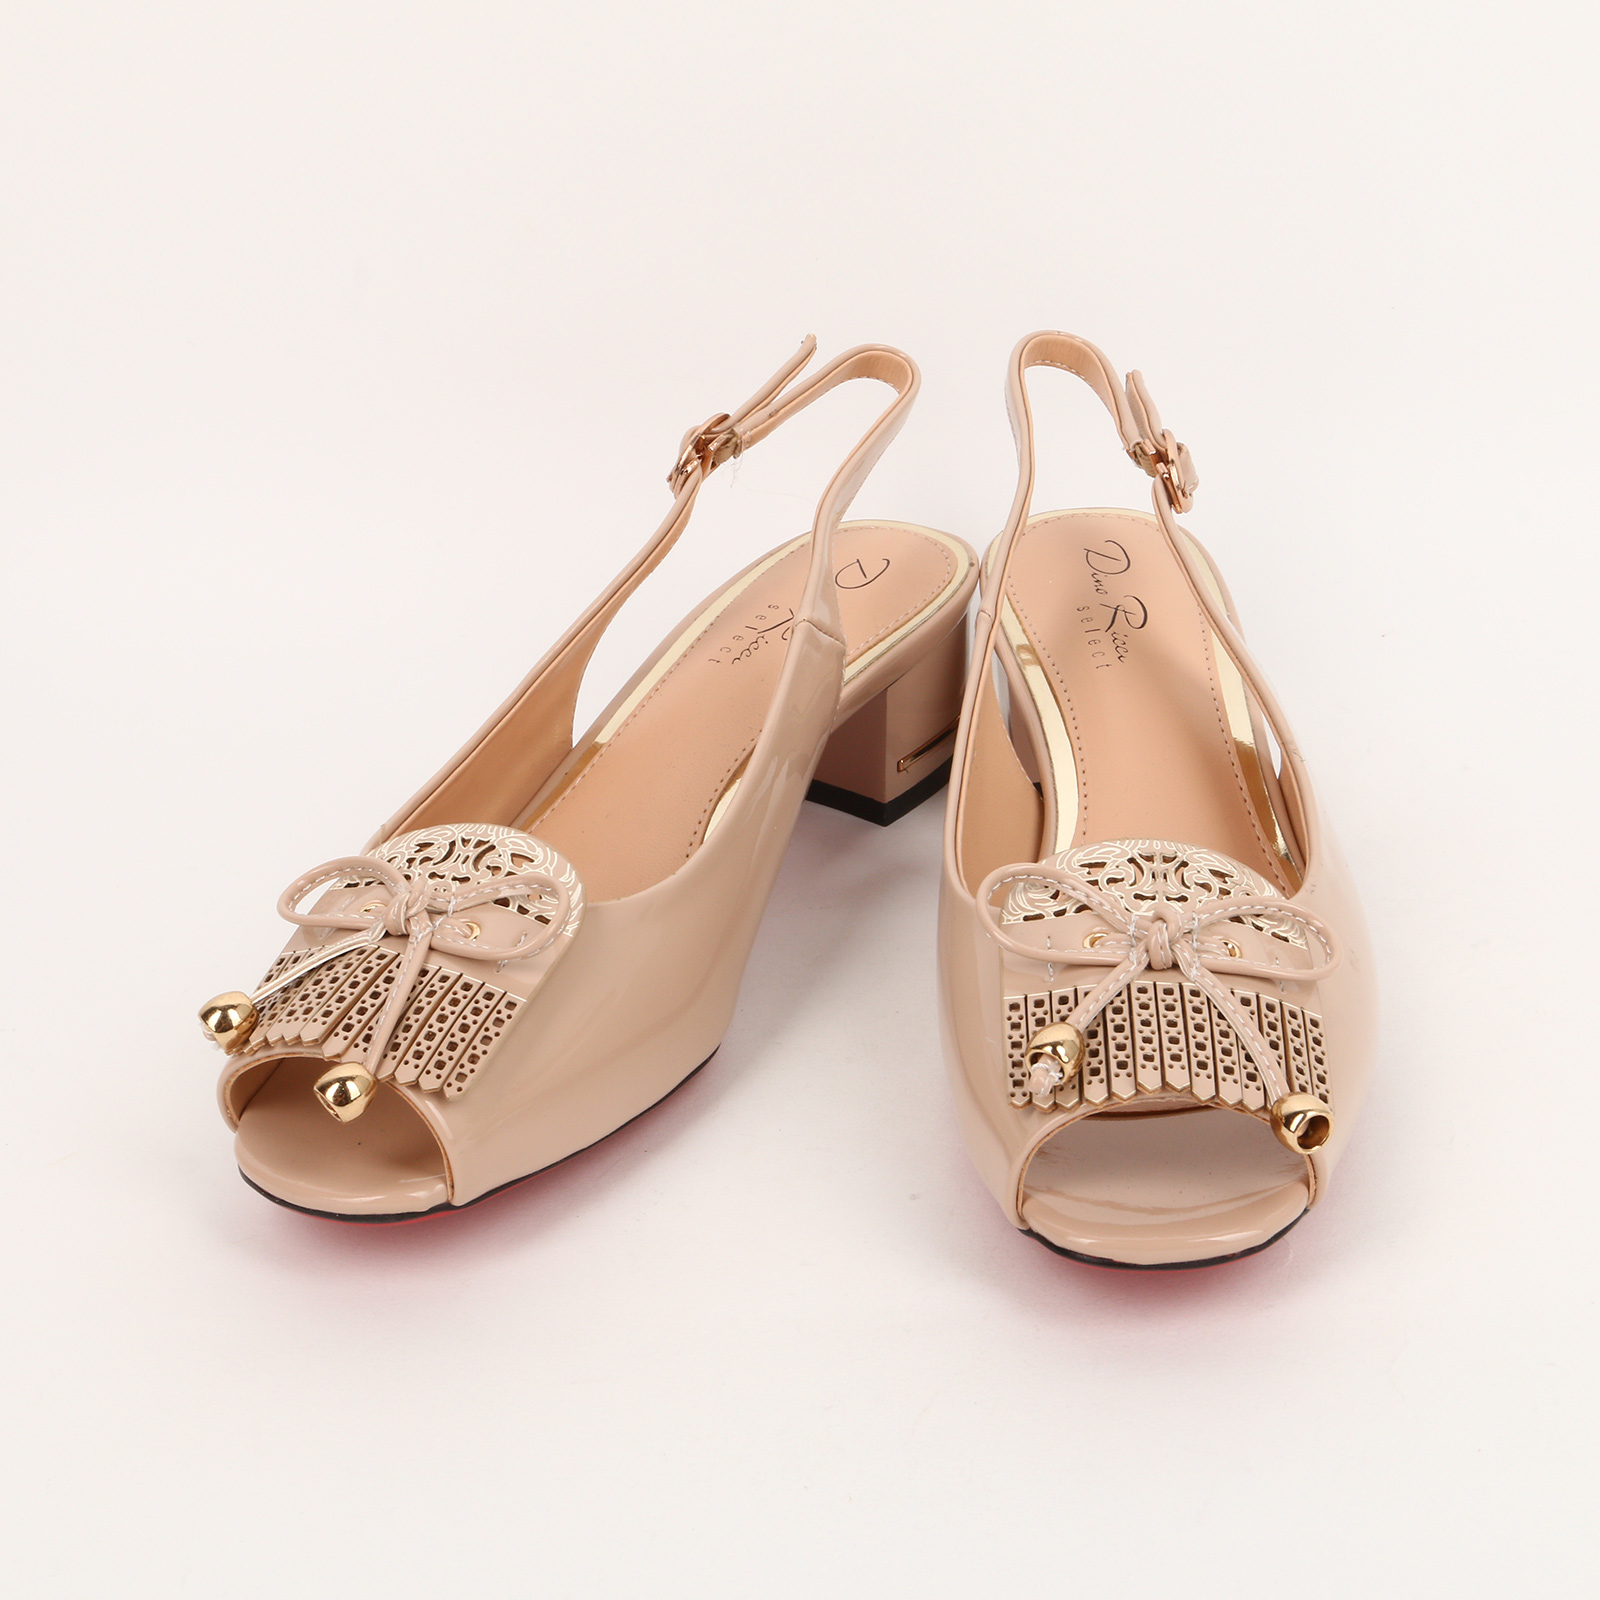 Туфли на устойчивом каблуке и с украшением